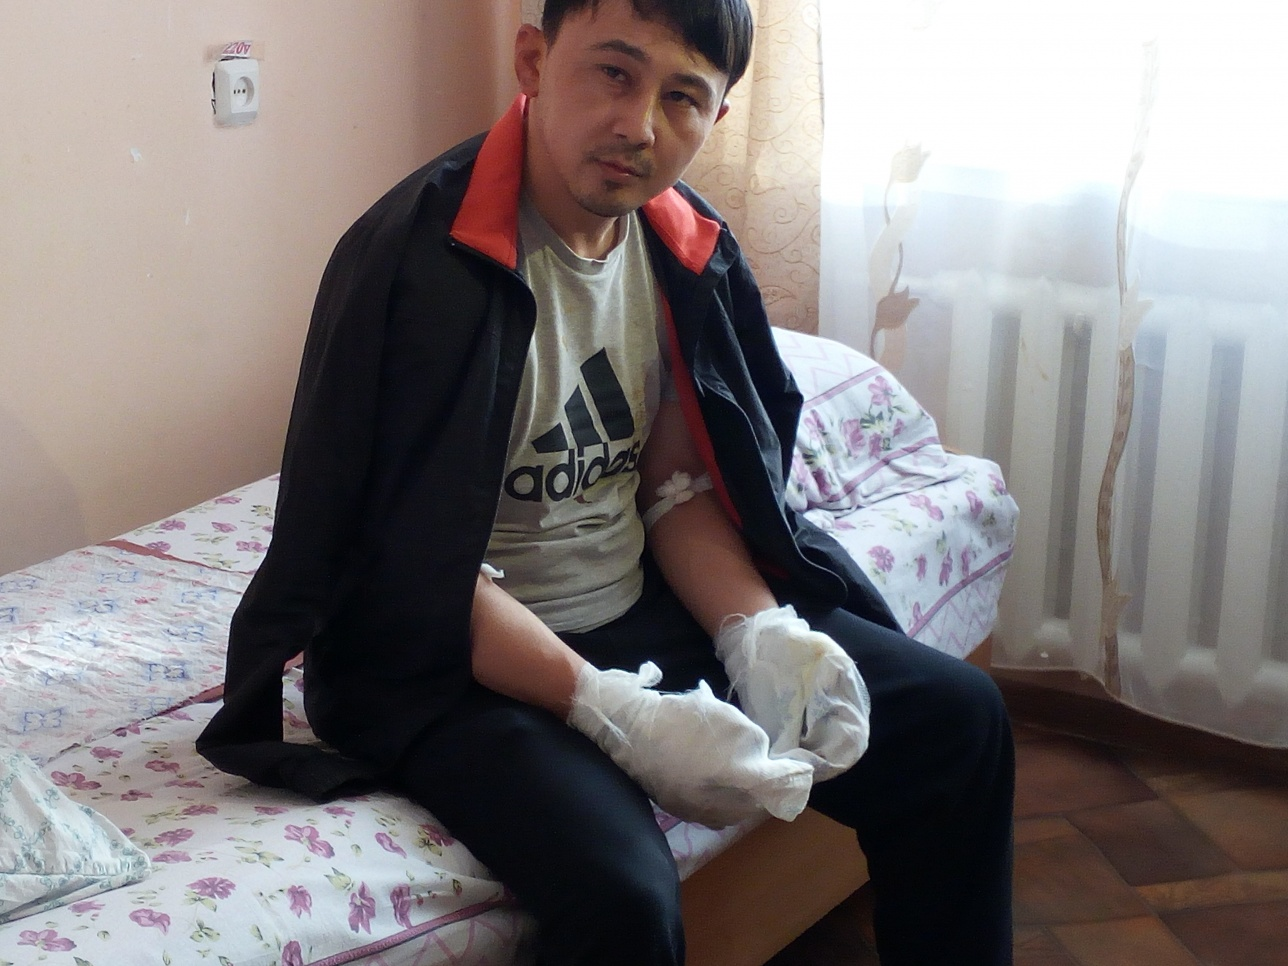 При задержании беглецов Нуржан обморозил руки